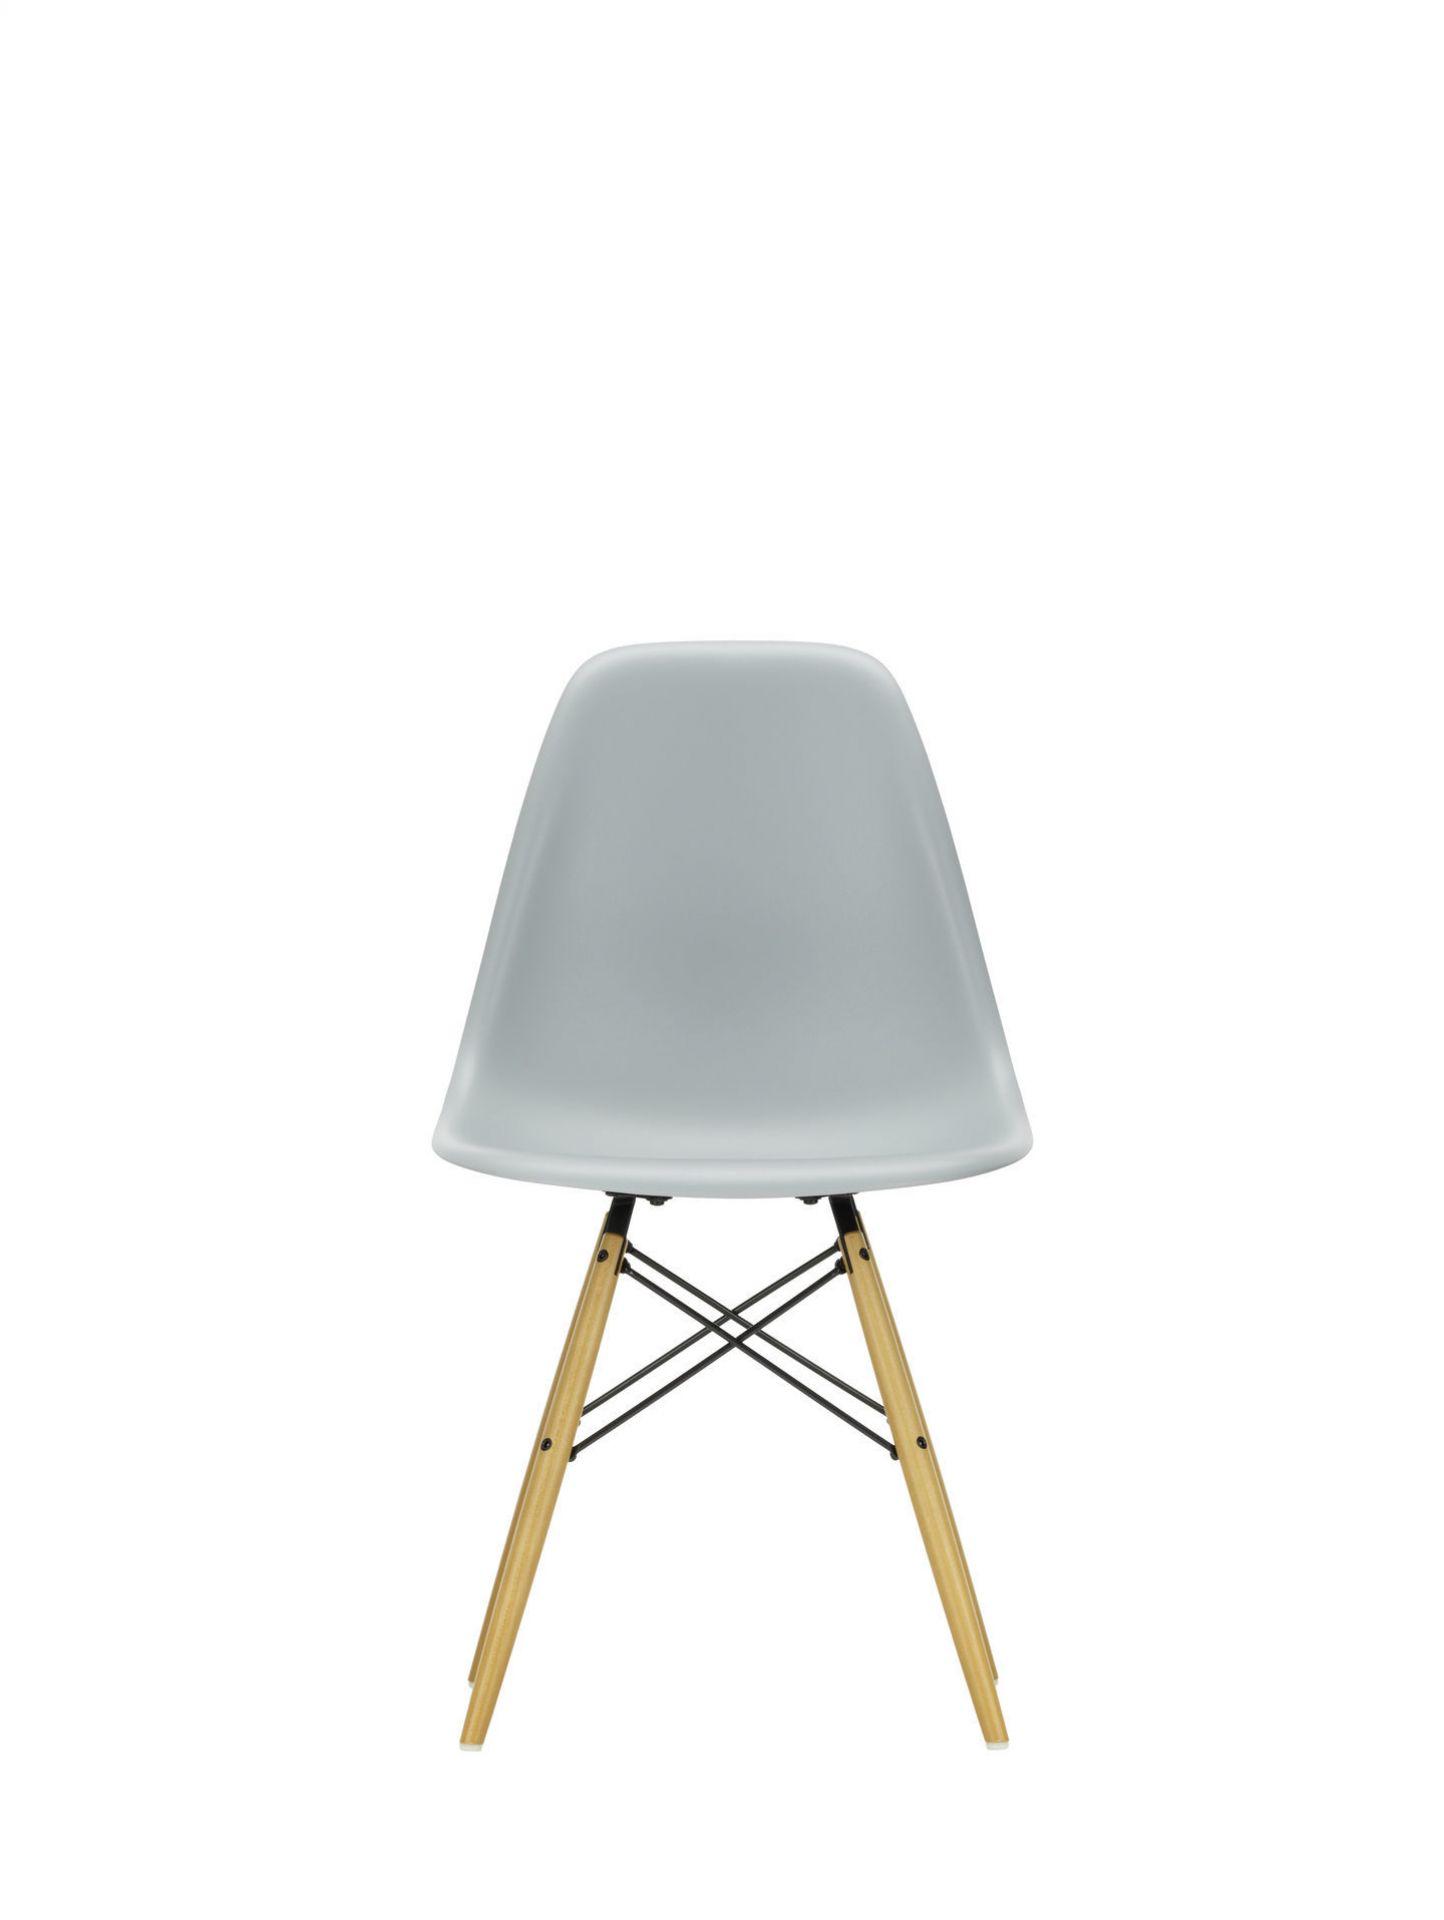 Eames Plastic Side Chair DSW Stuhl Vitra Esche honigfarben-Weiss